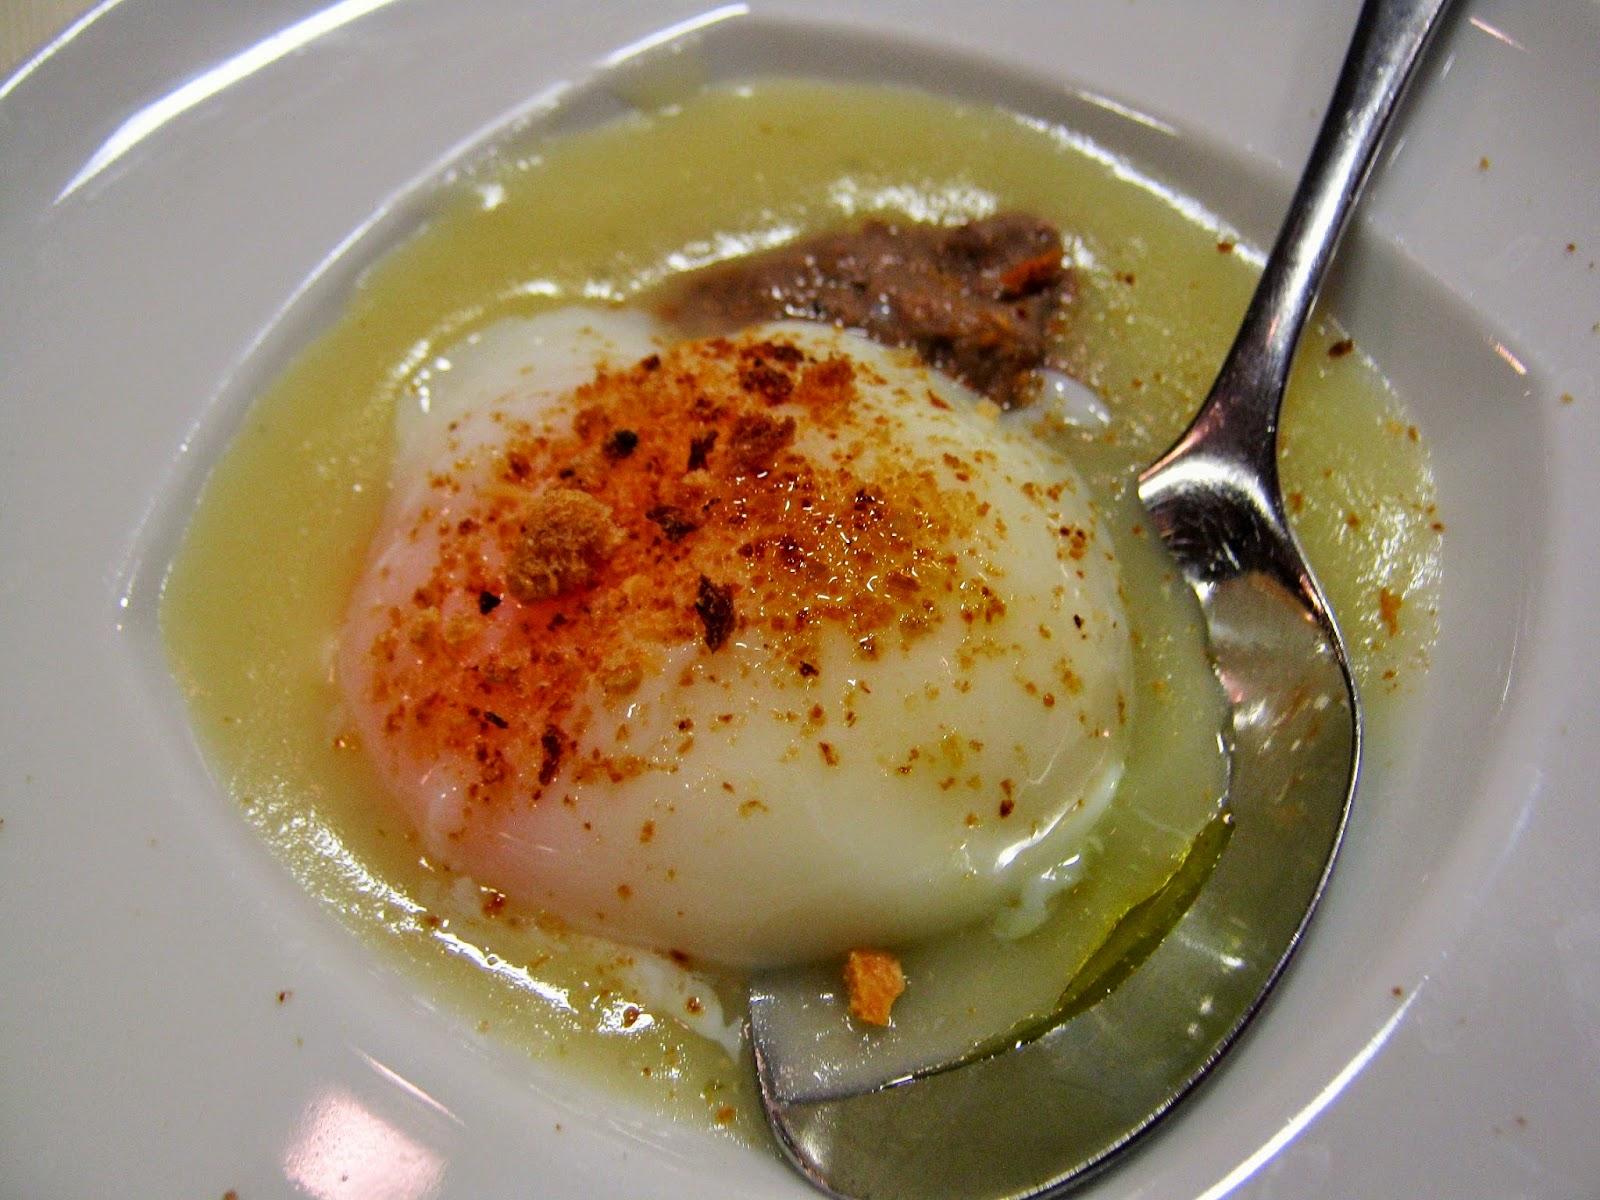 uovo poché cucina.eat